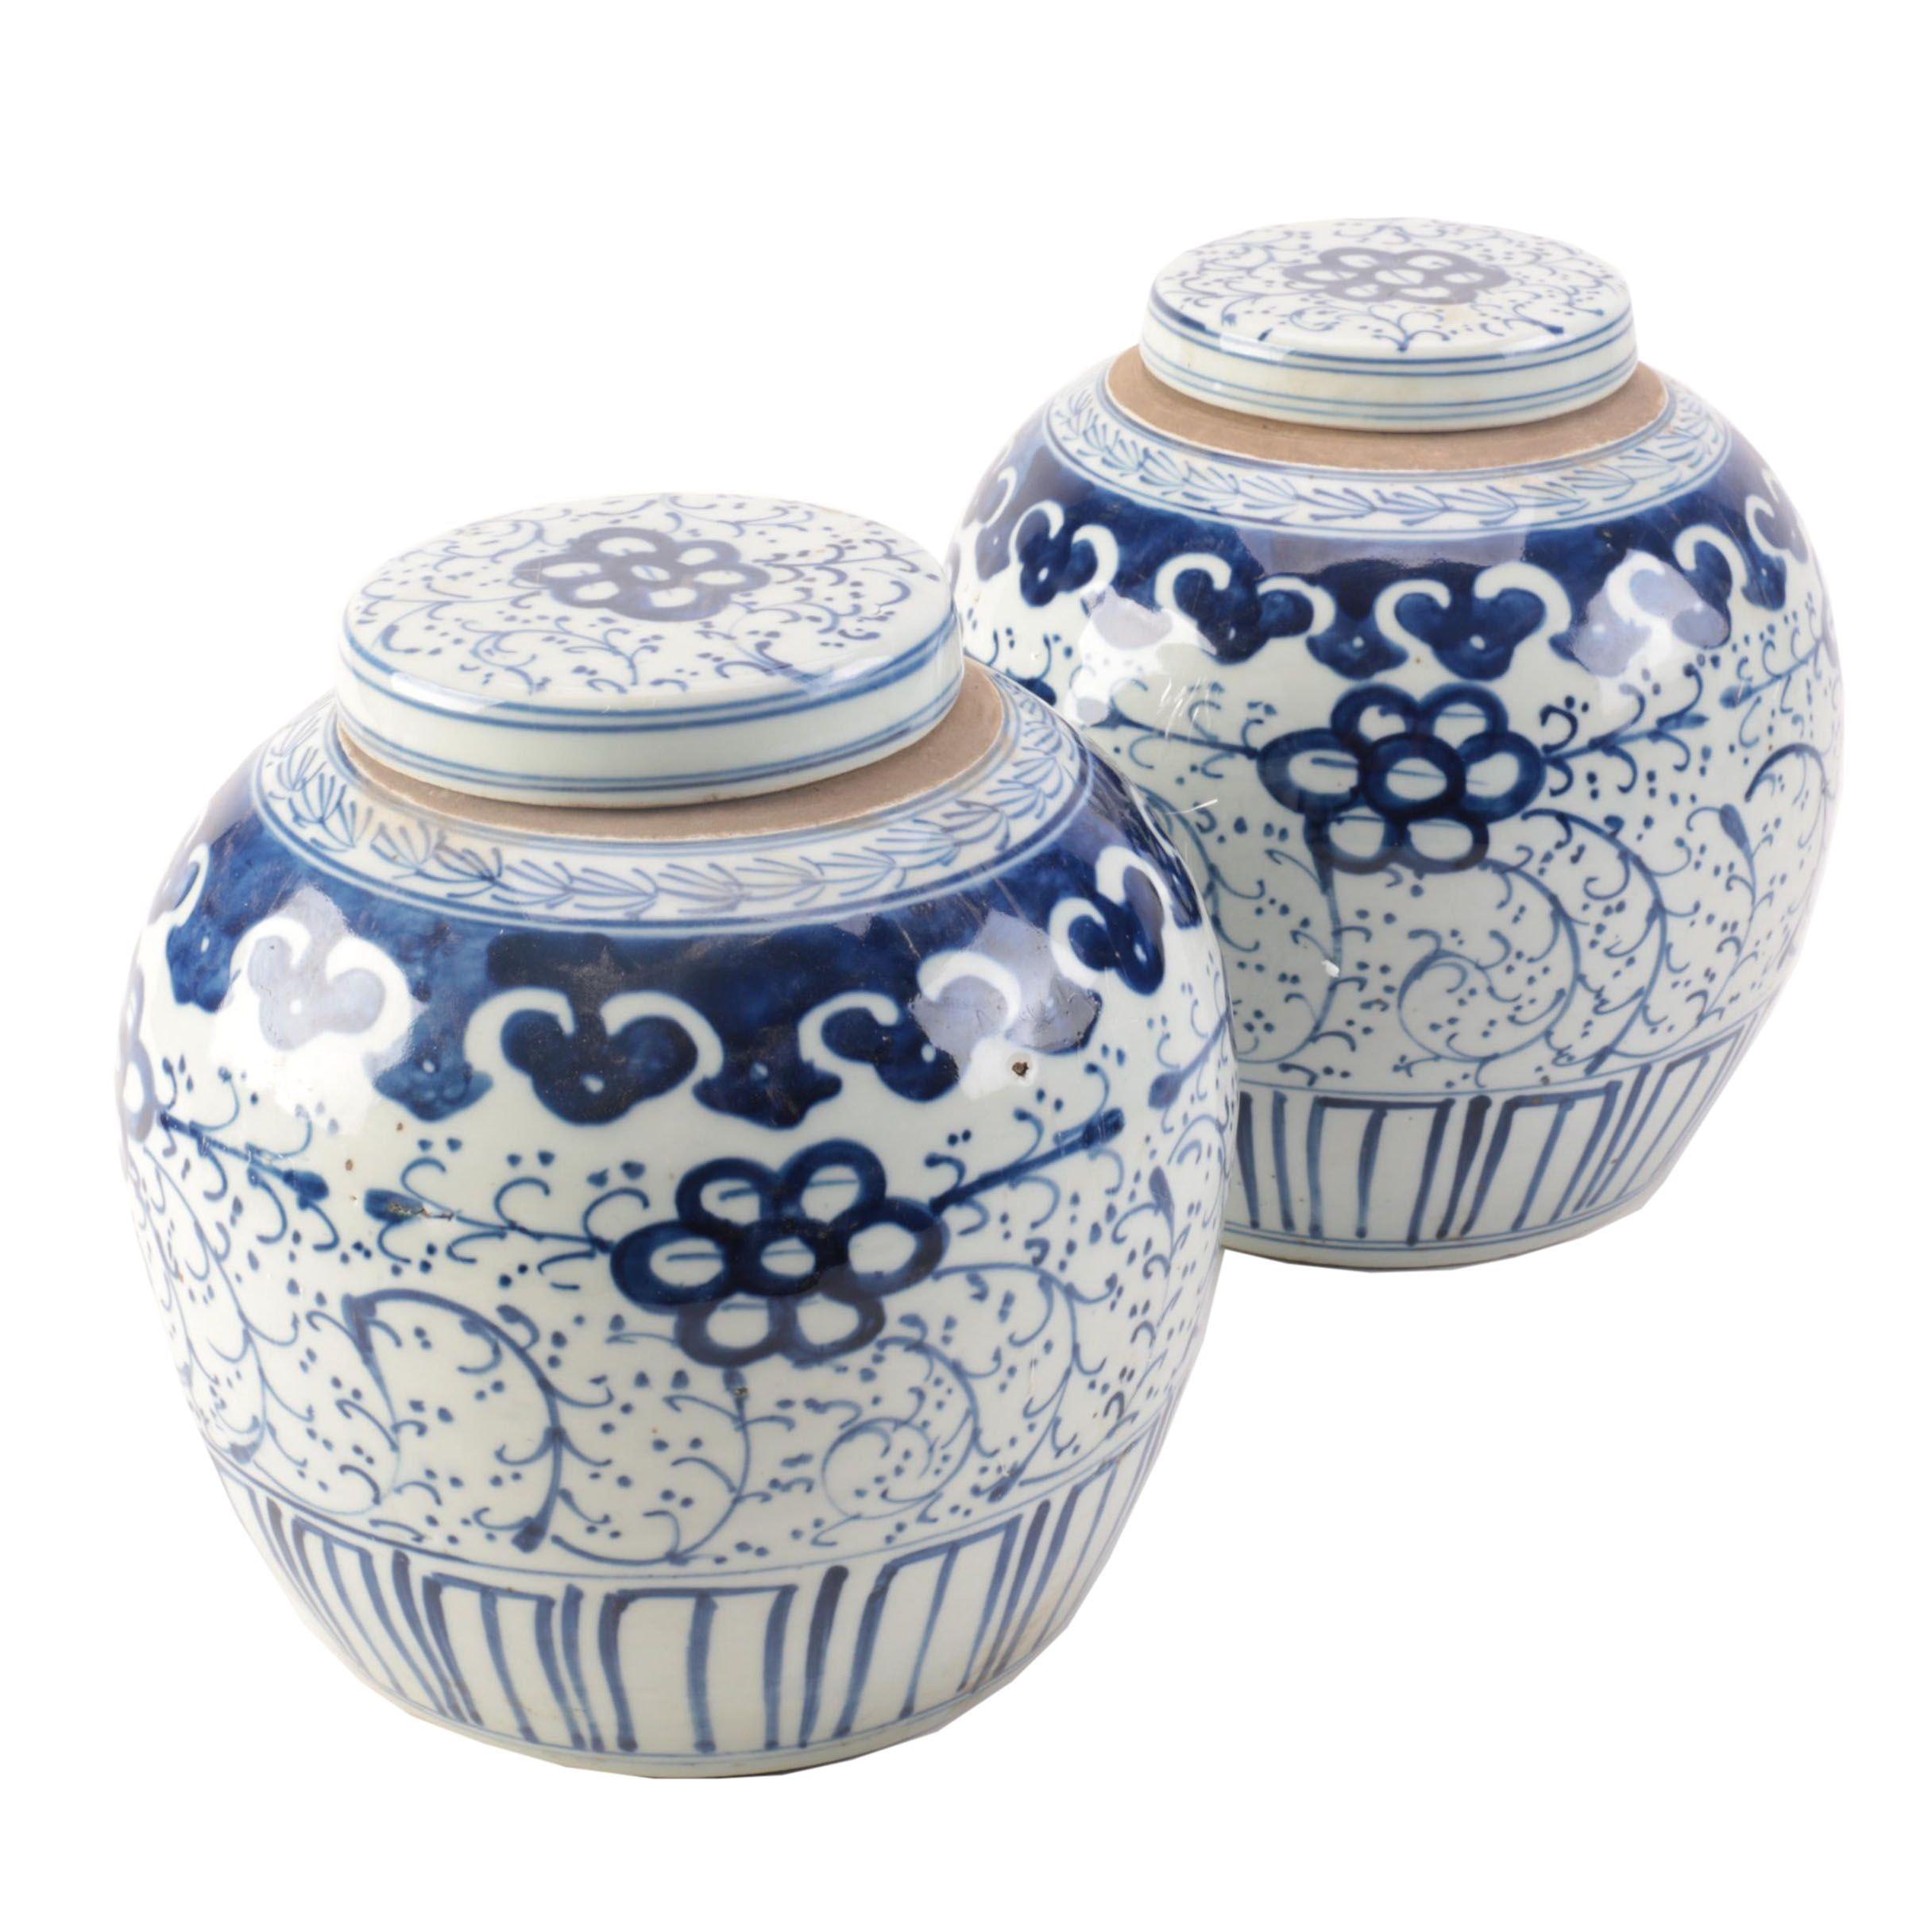 Vintage Chinese Hand Decorated Porcelain Ginger Jars